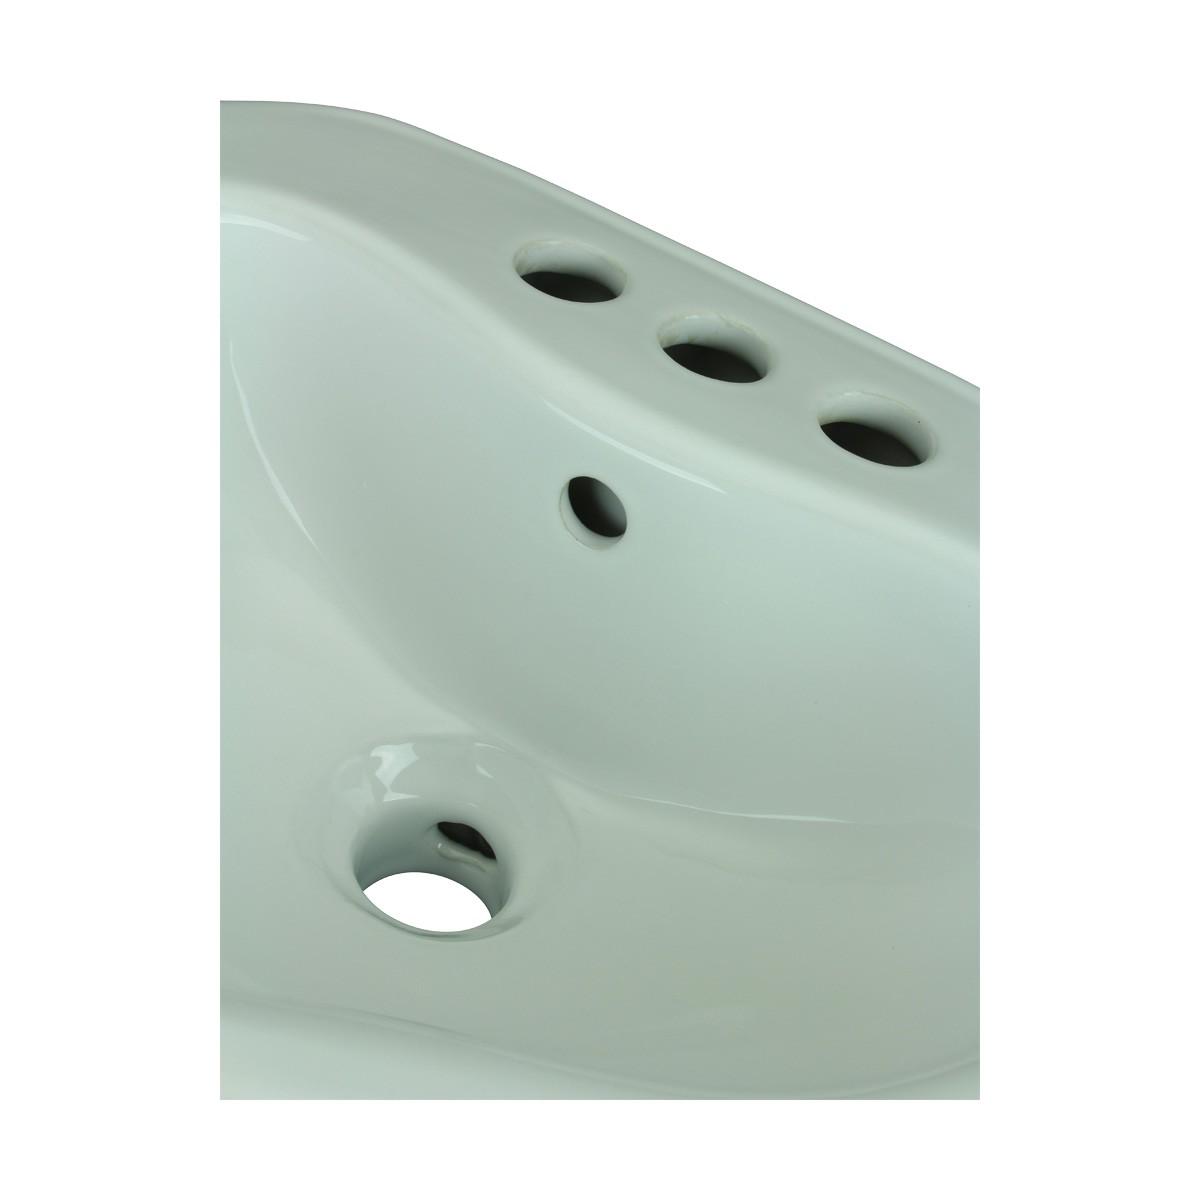 Renovators Supply Childrens Bathroom Pedestal Sink White Porcelain Sweethear Child Sink Childrens Sink ChildSize Sink